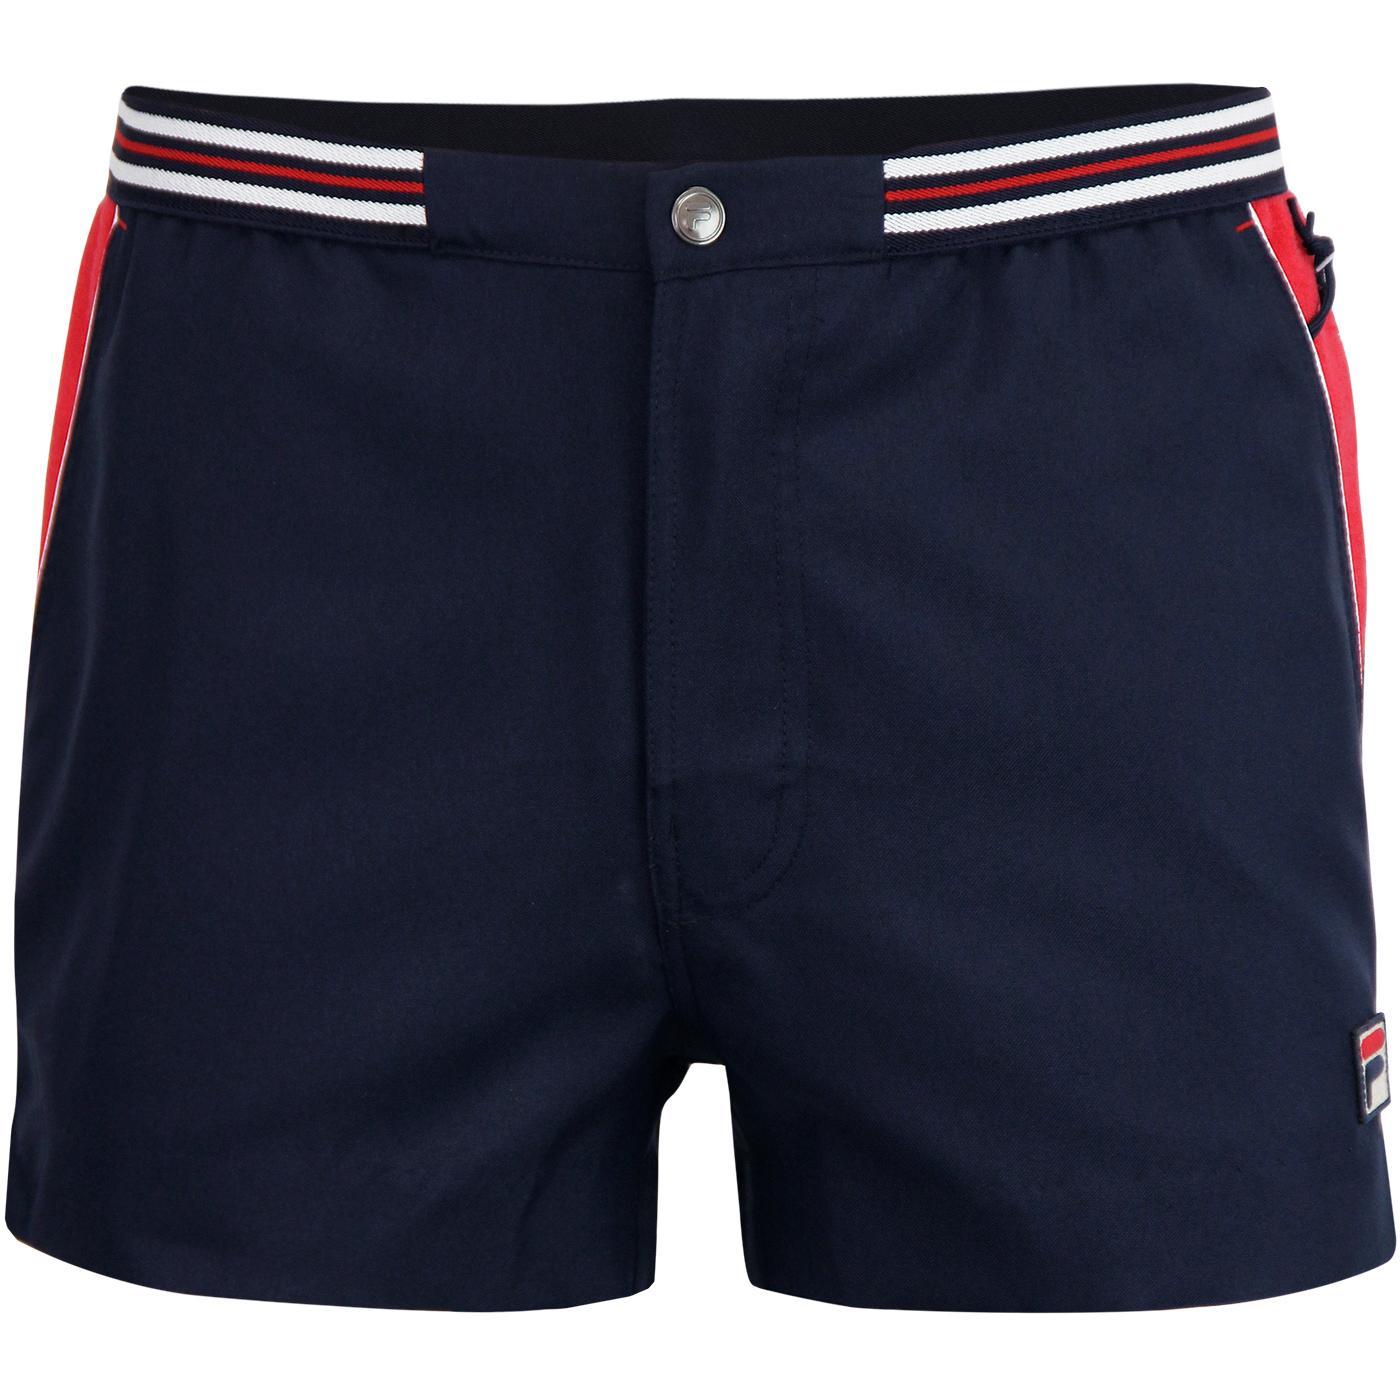 Hightide 4 FILA VINTAGE Mens 70s Tennis Shorts P/C